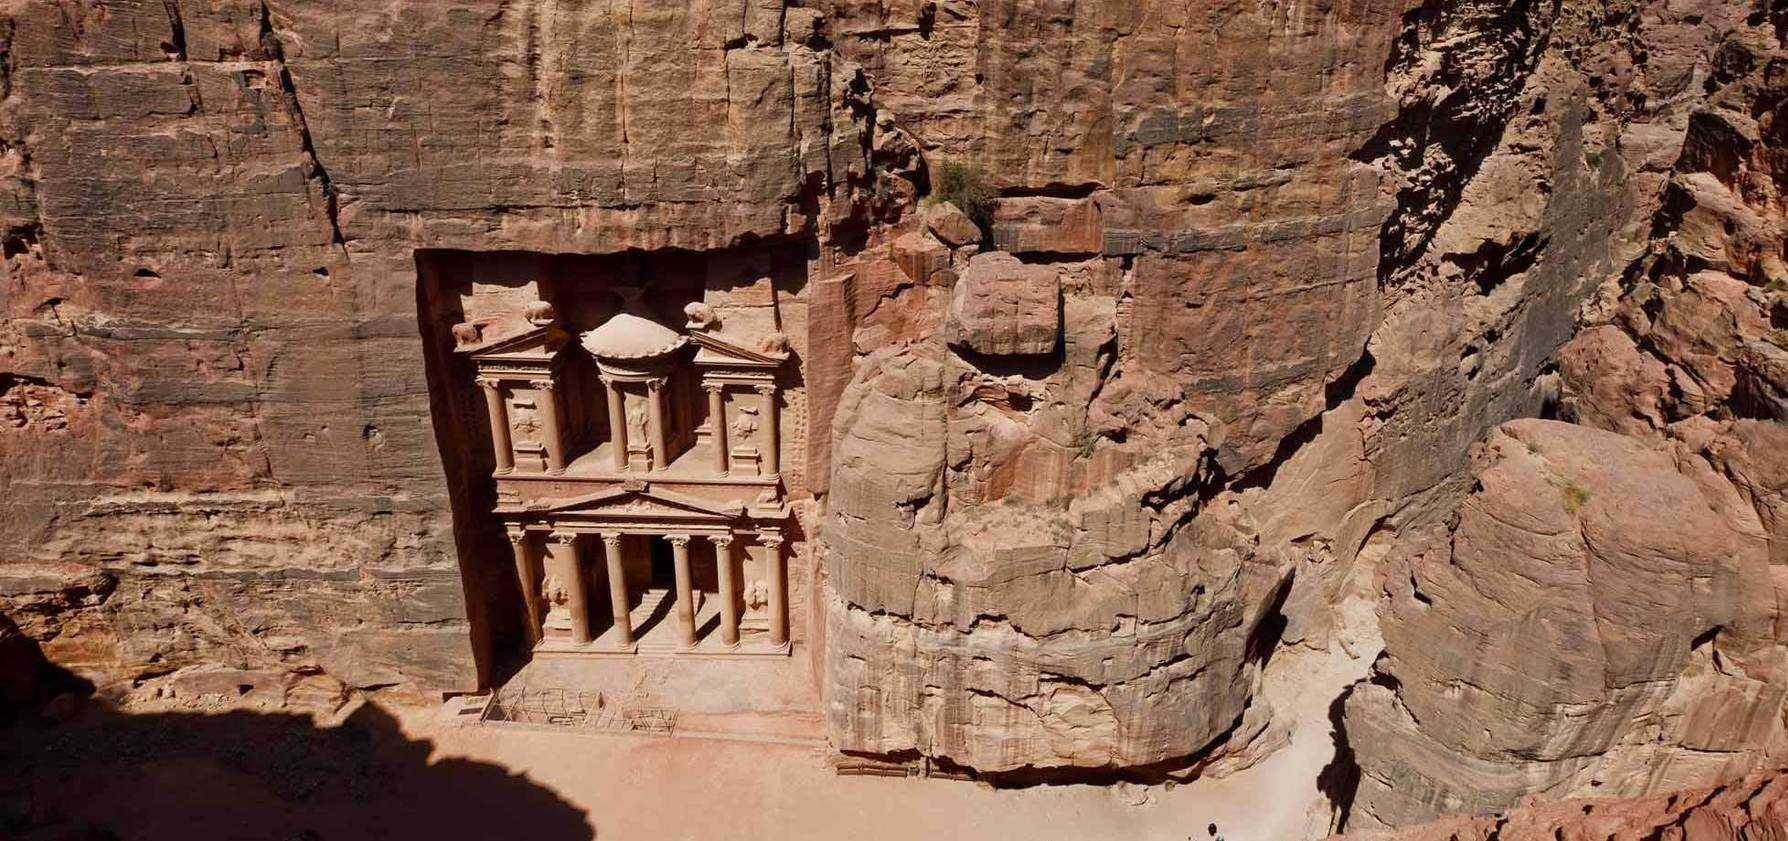 Jordan tours , Tours in Jordan, Petra best shot